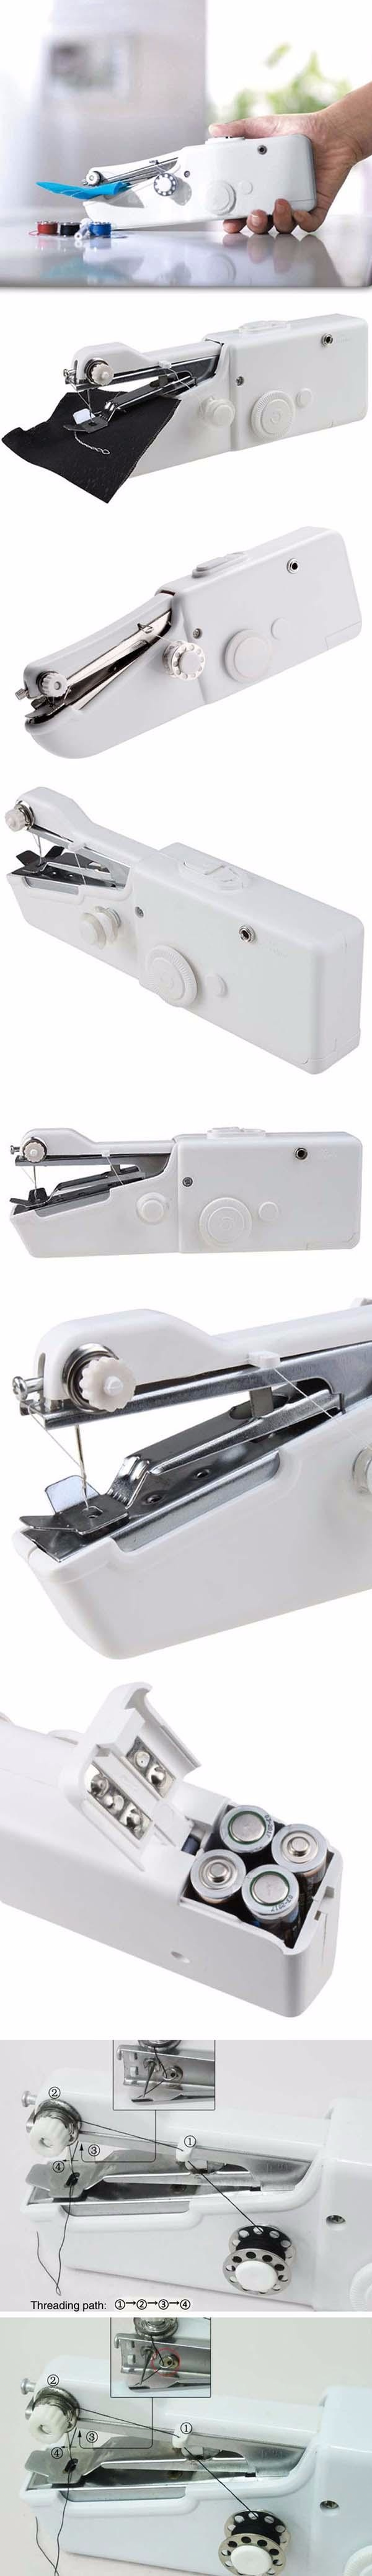 sewing machine (8)